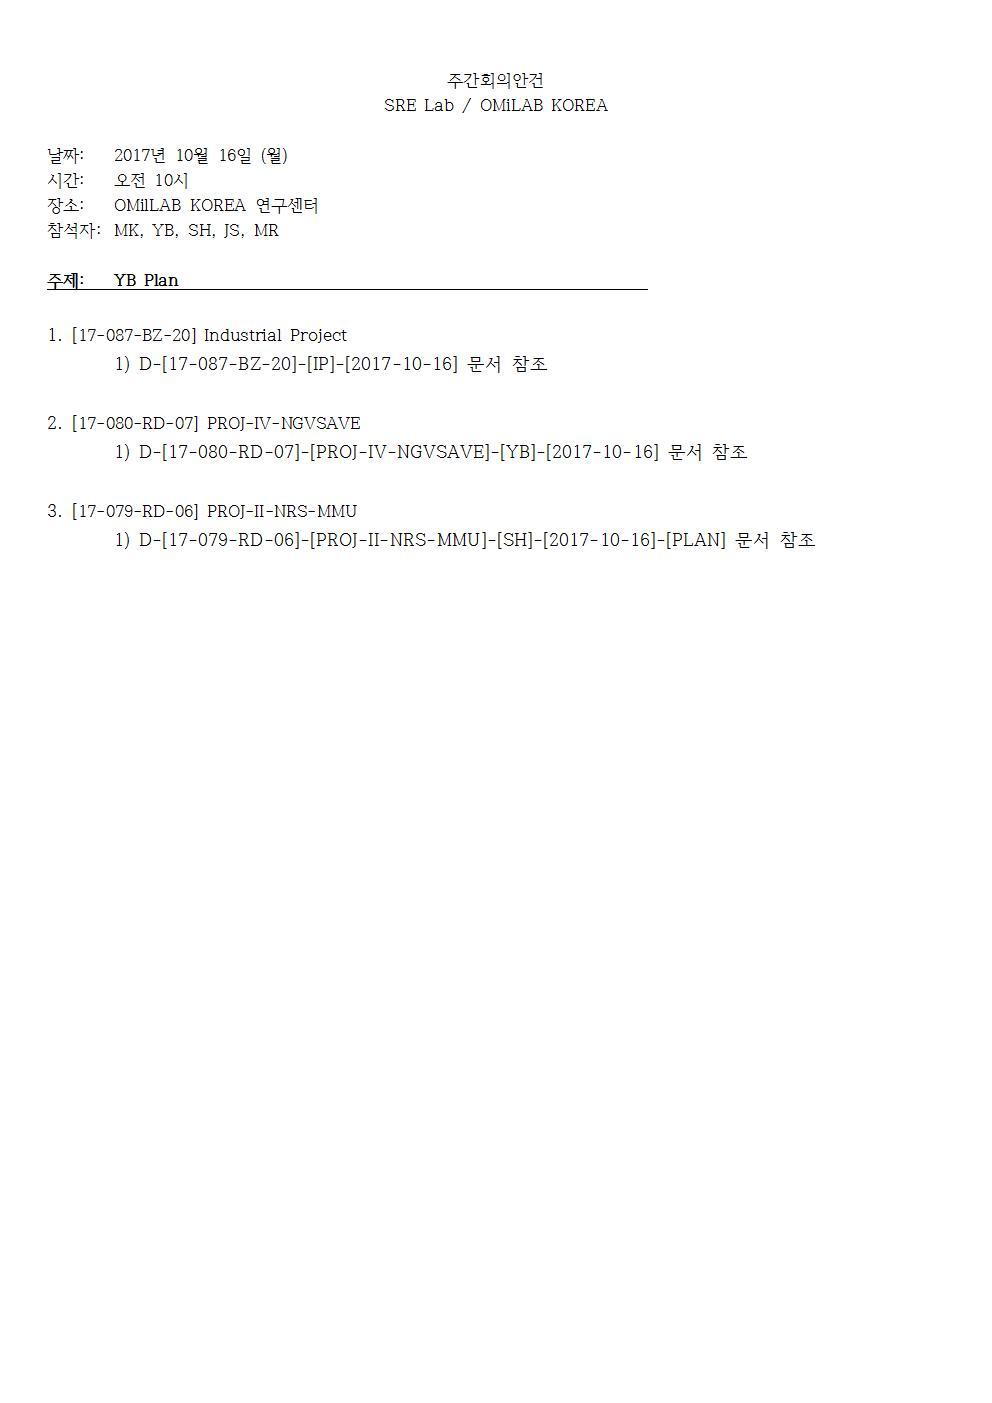 1-Mon-2017-10-16-PLAN(YB)001.jpg